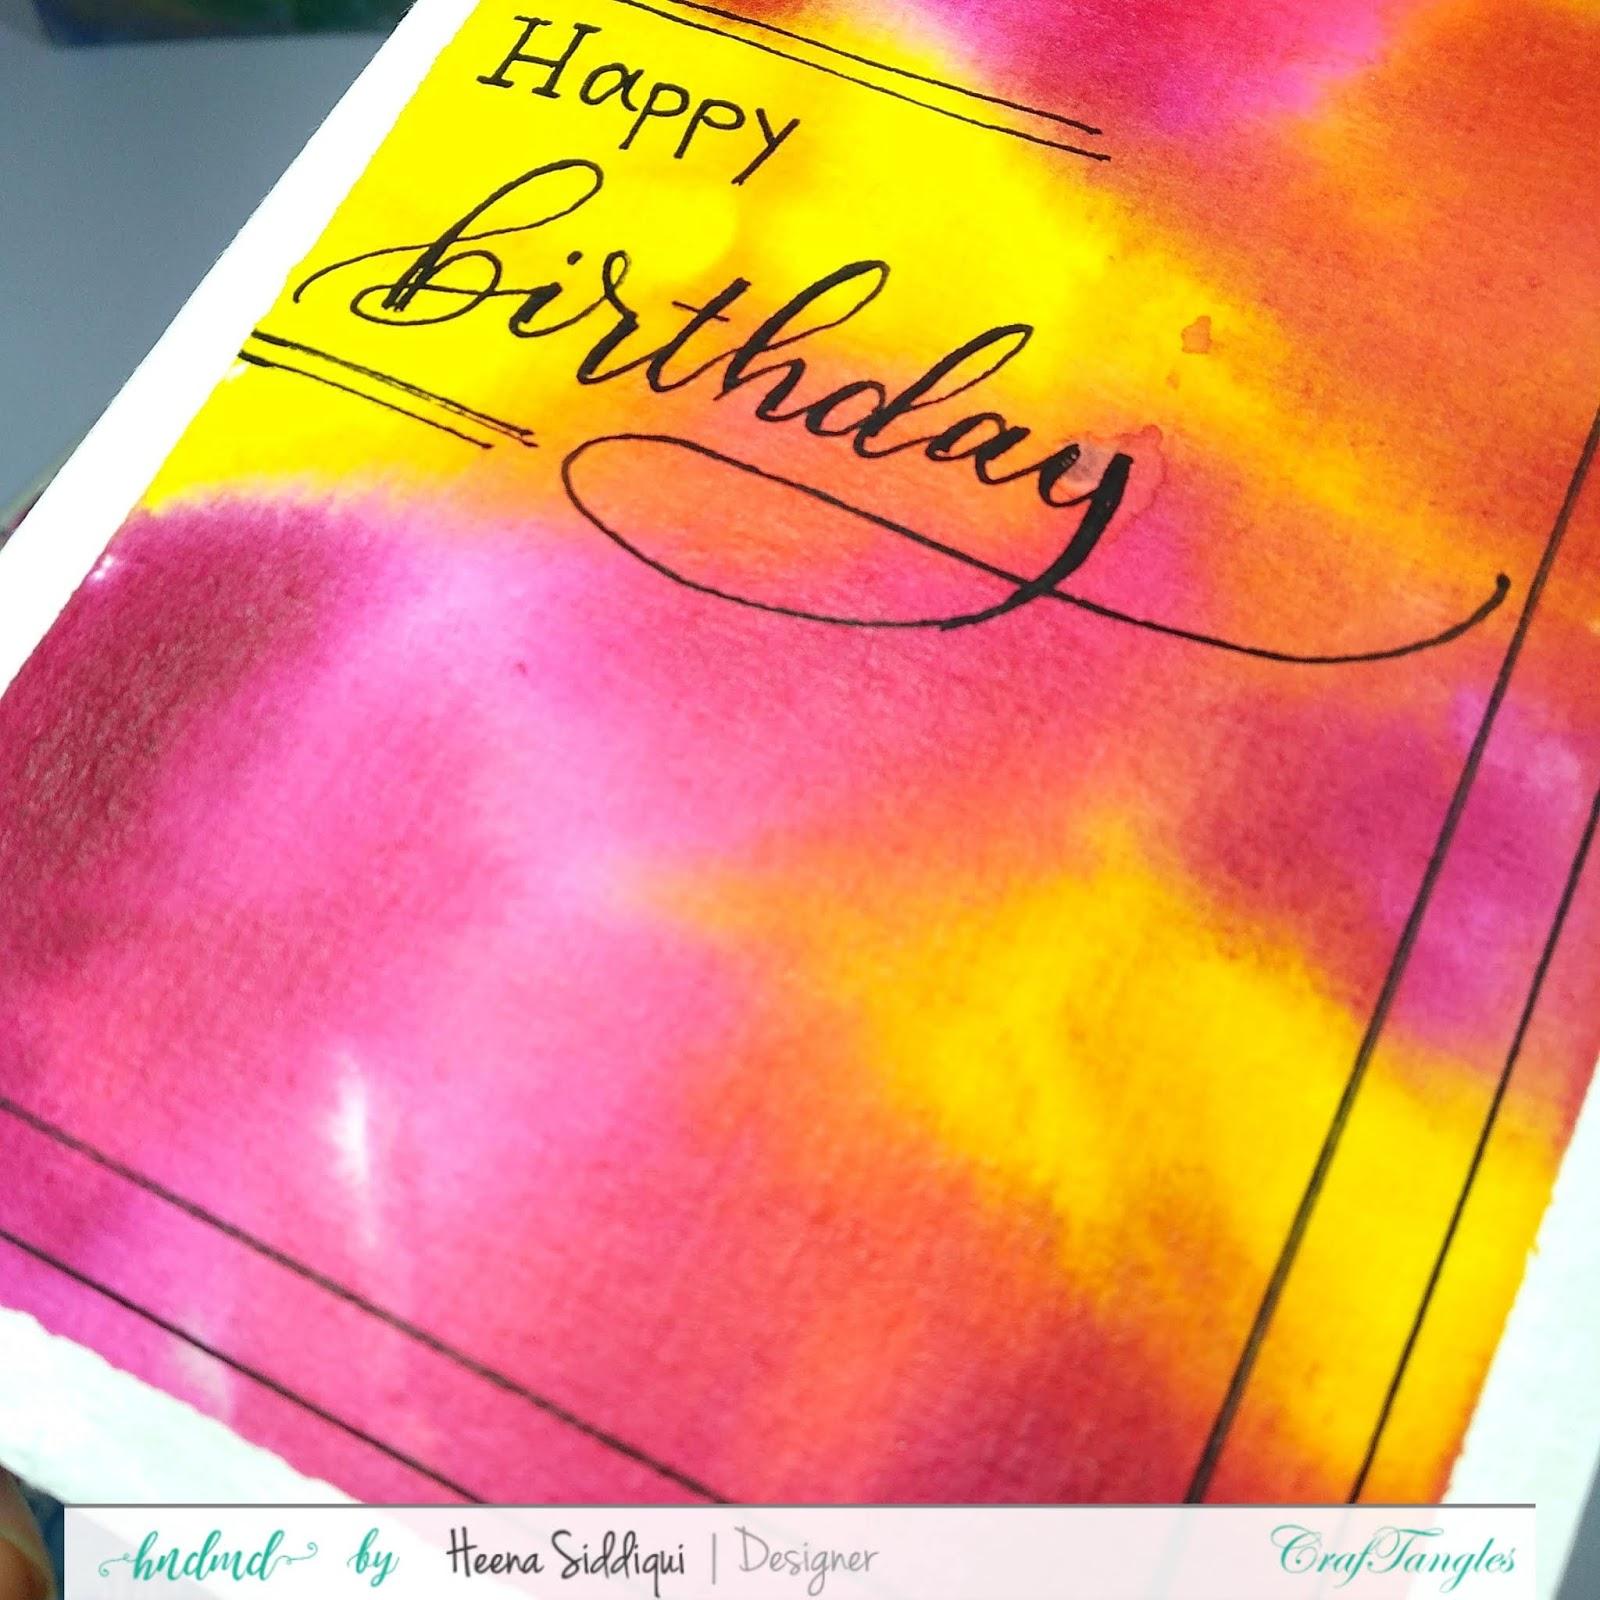 Calligraphy & Vibrant Background using Craftangles Liquid Watercolors 2